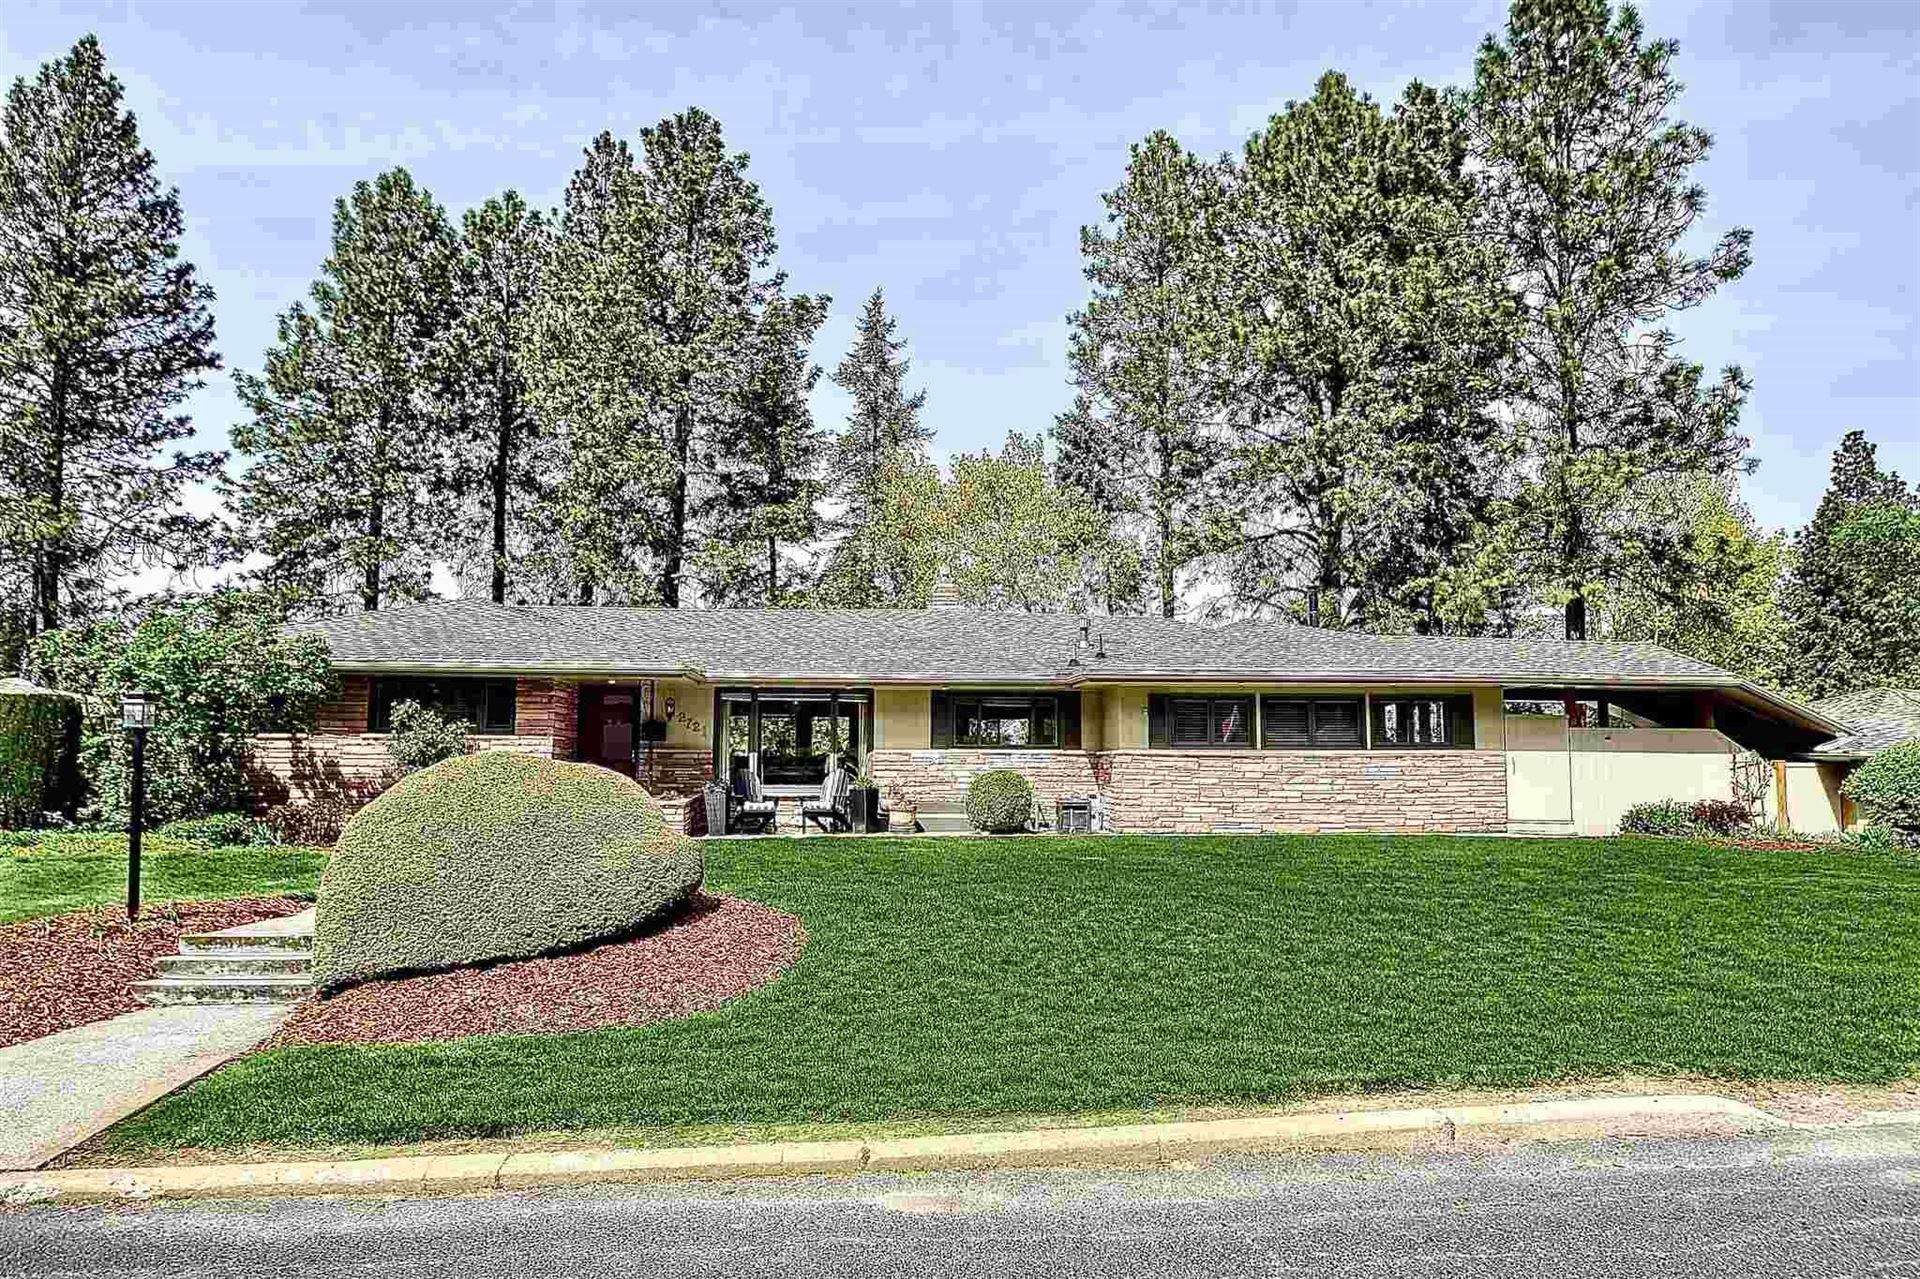 2721 E Mount Vernon Dr, Spokane, WA 99223-5027 - #: 202115034